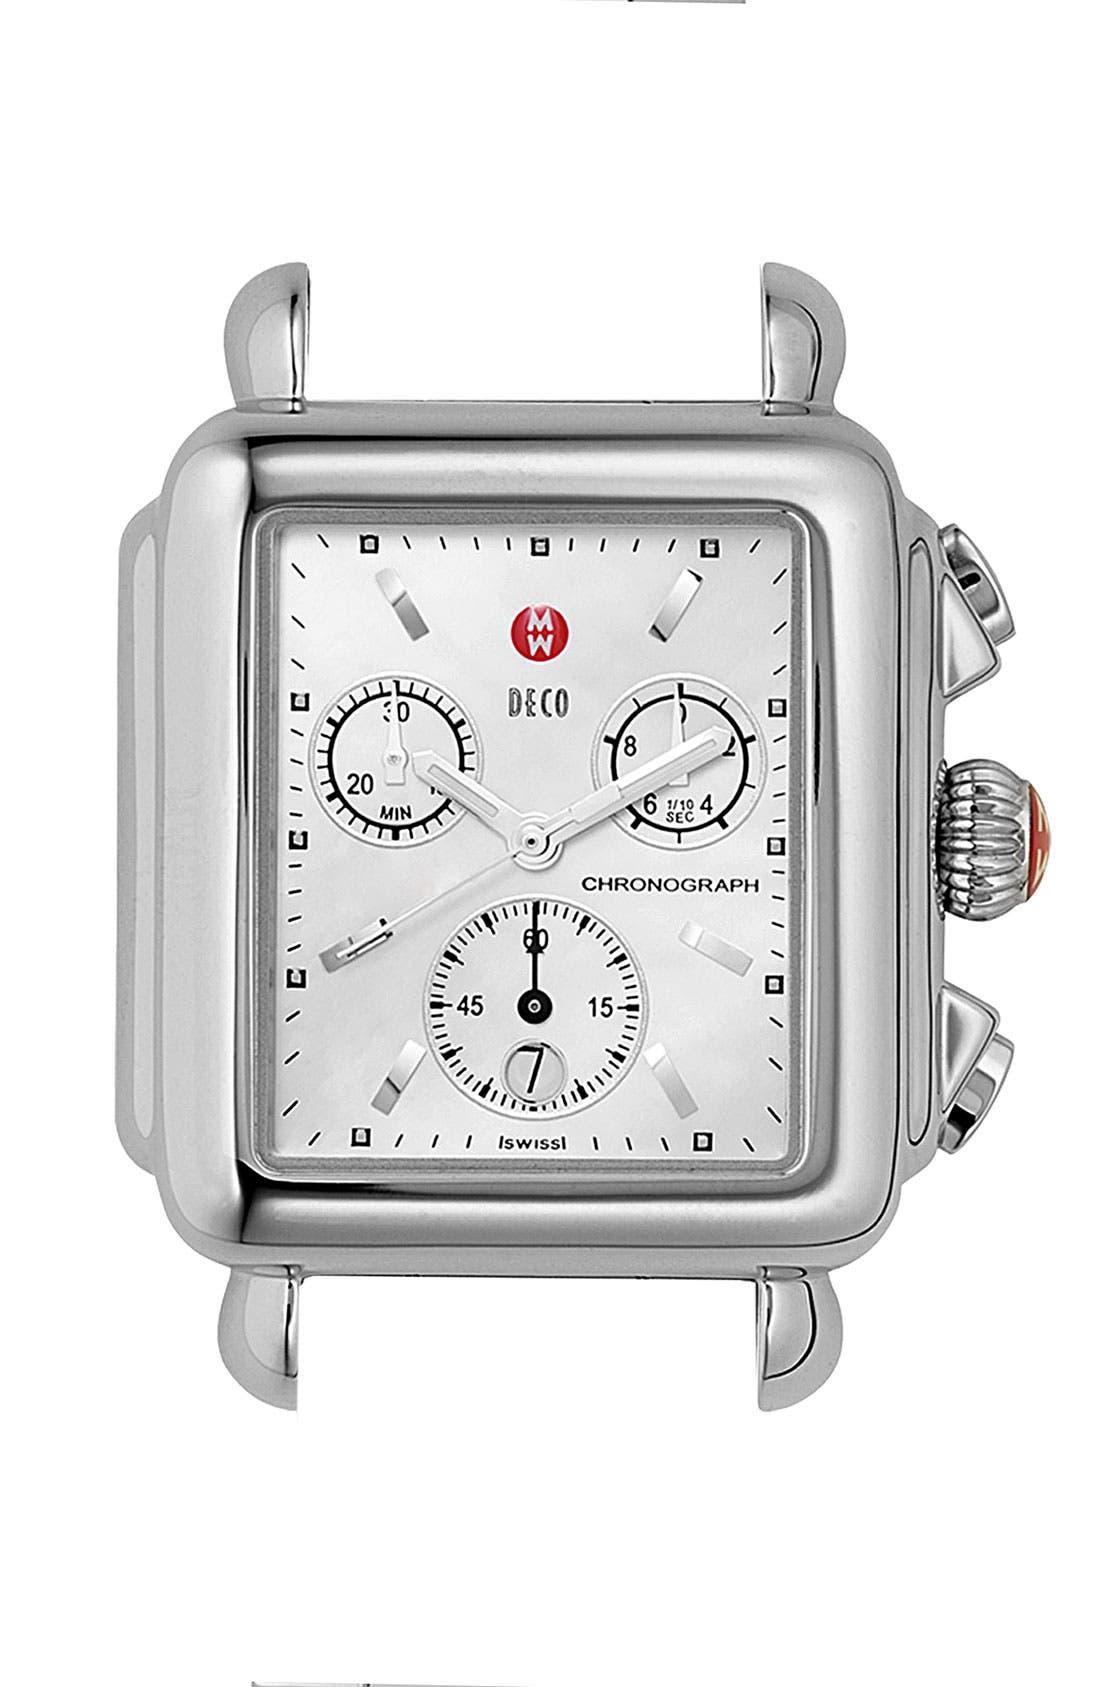 'Deco Carousel' Watch Case,                             Main thumbnail 1, color,                             040